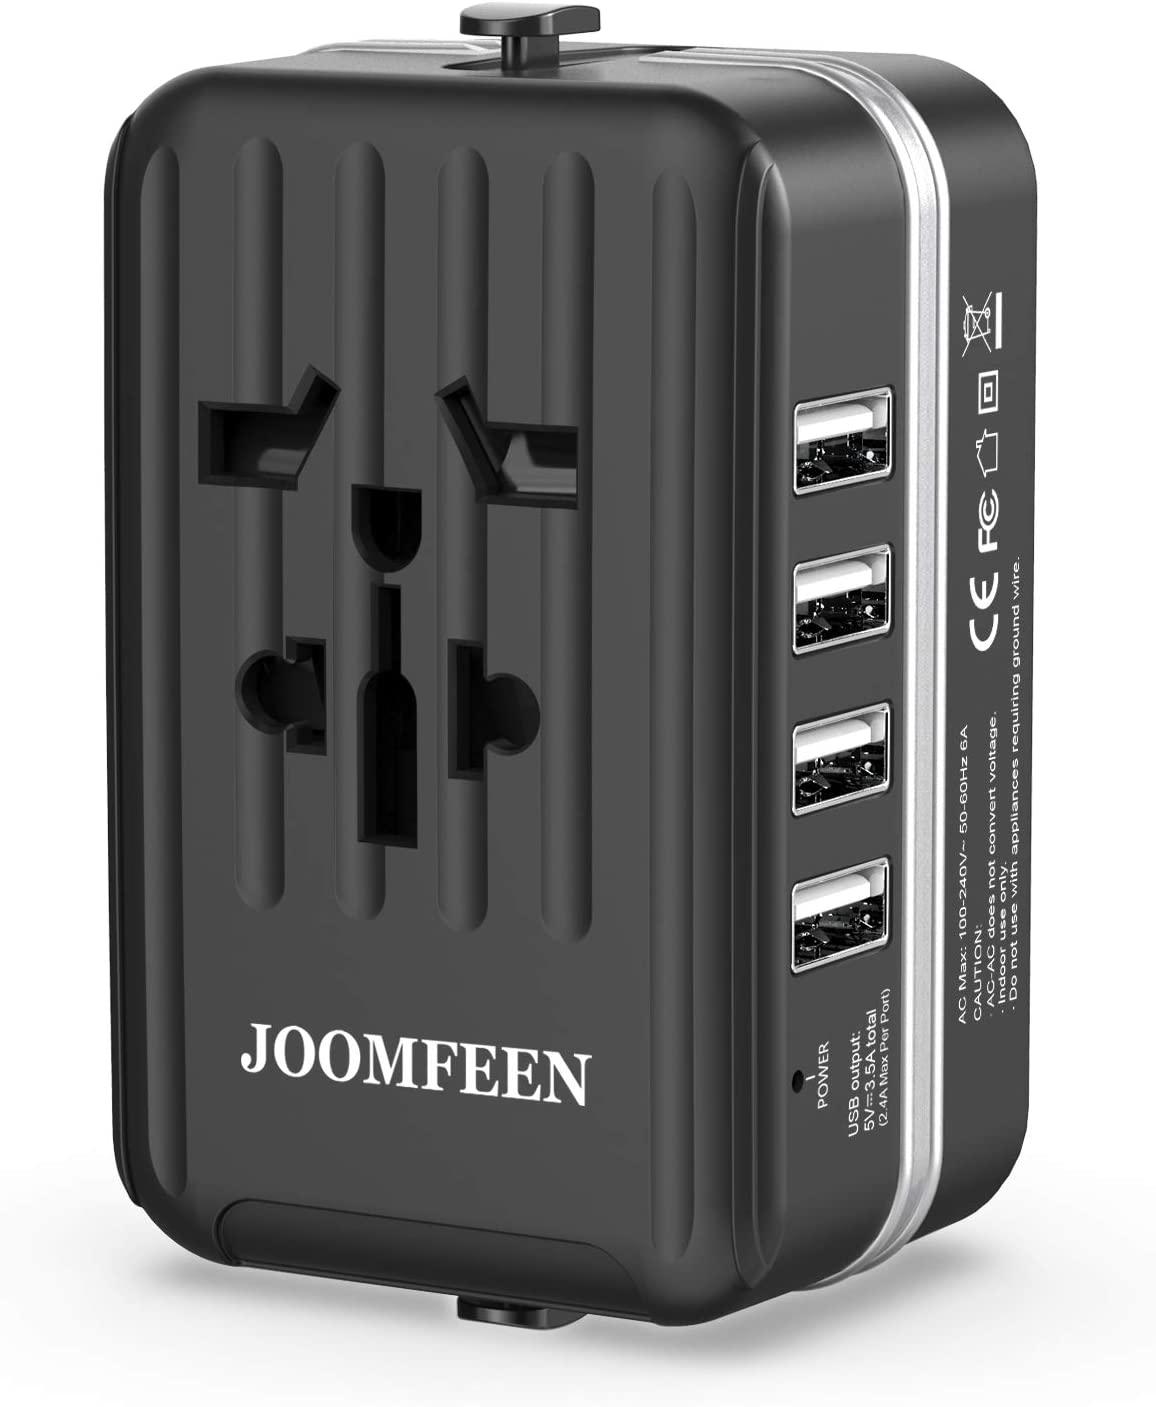 JOOMFEEN Adaptador Enchufe Universal, Adaptador De Viaje Internacional con 4 Puertos USB para Ingles/EEUU/Irlanda/Inglaterra/Chino/Americano/Europeo/Japon/Canada USA EU UK AU De 150 Países(Negro)